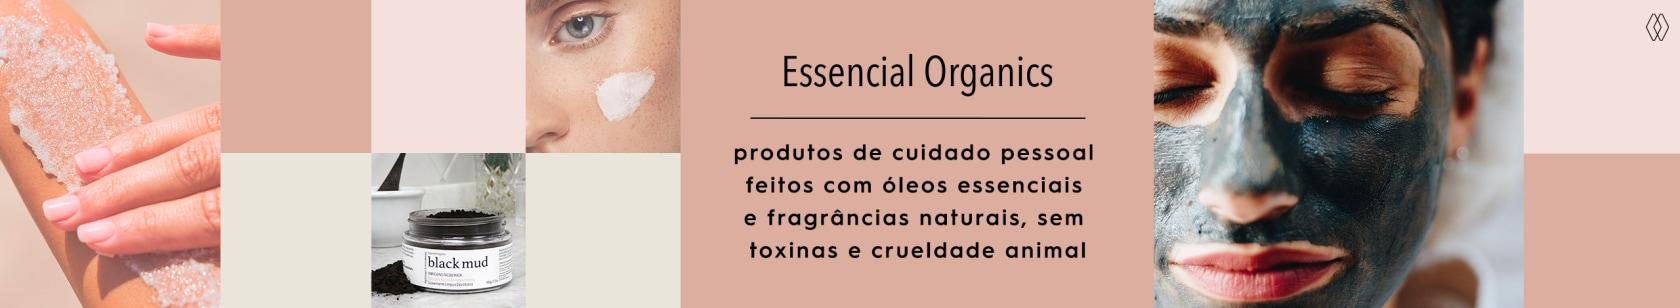 ESSENCIAL ORGANICS | AMARO